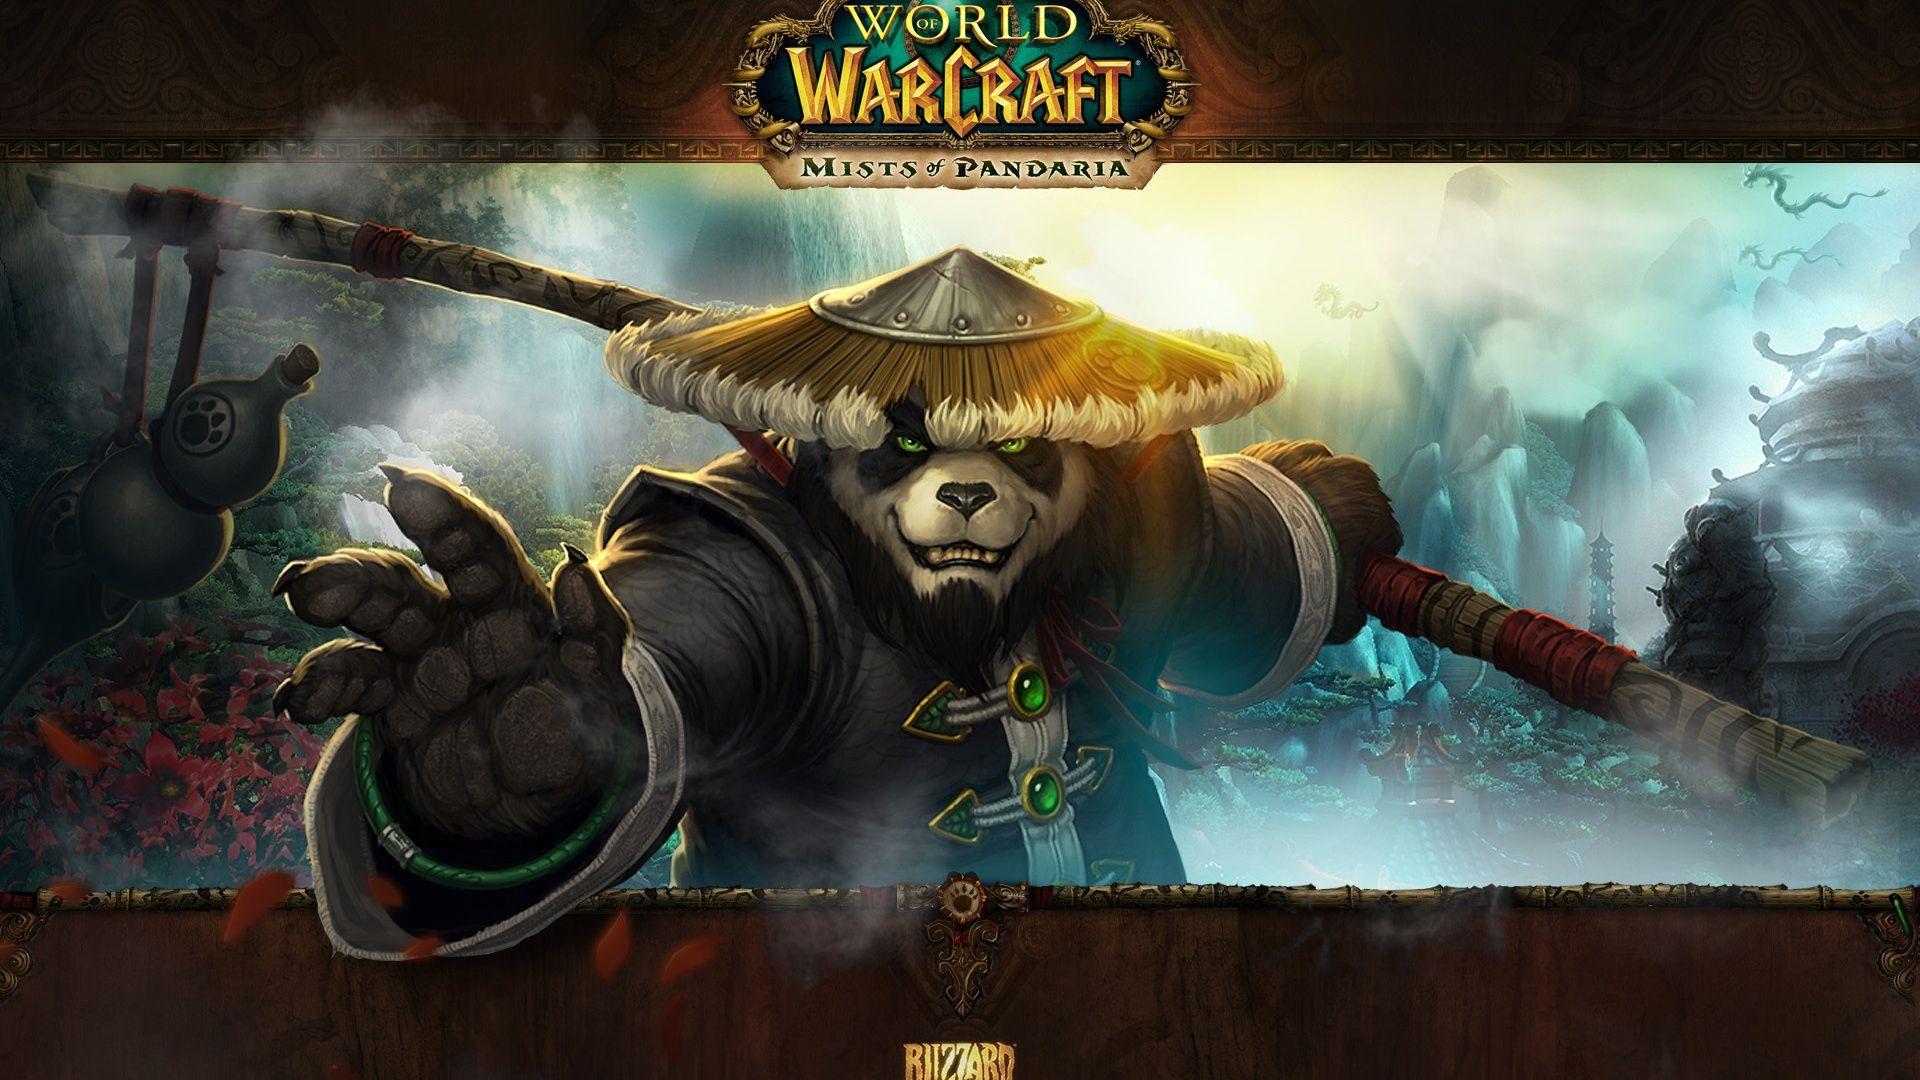 World Of Warcraft Mists Of Pandaria Wallpaper 1920x1080